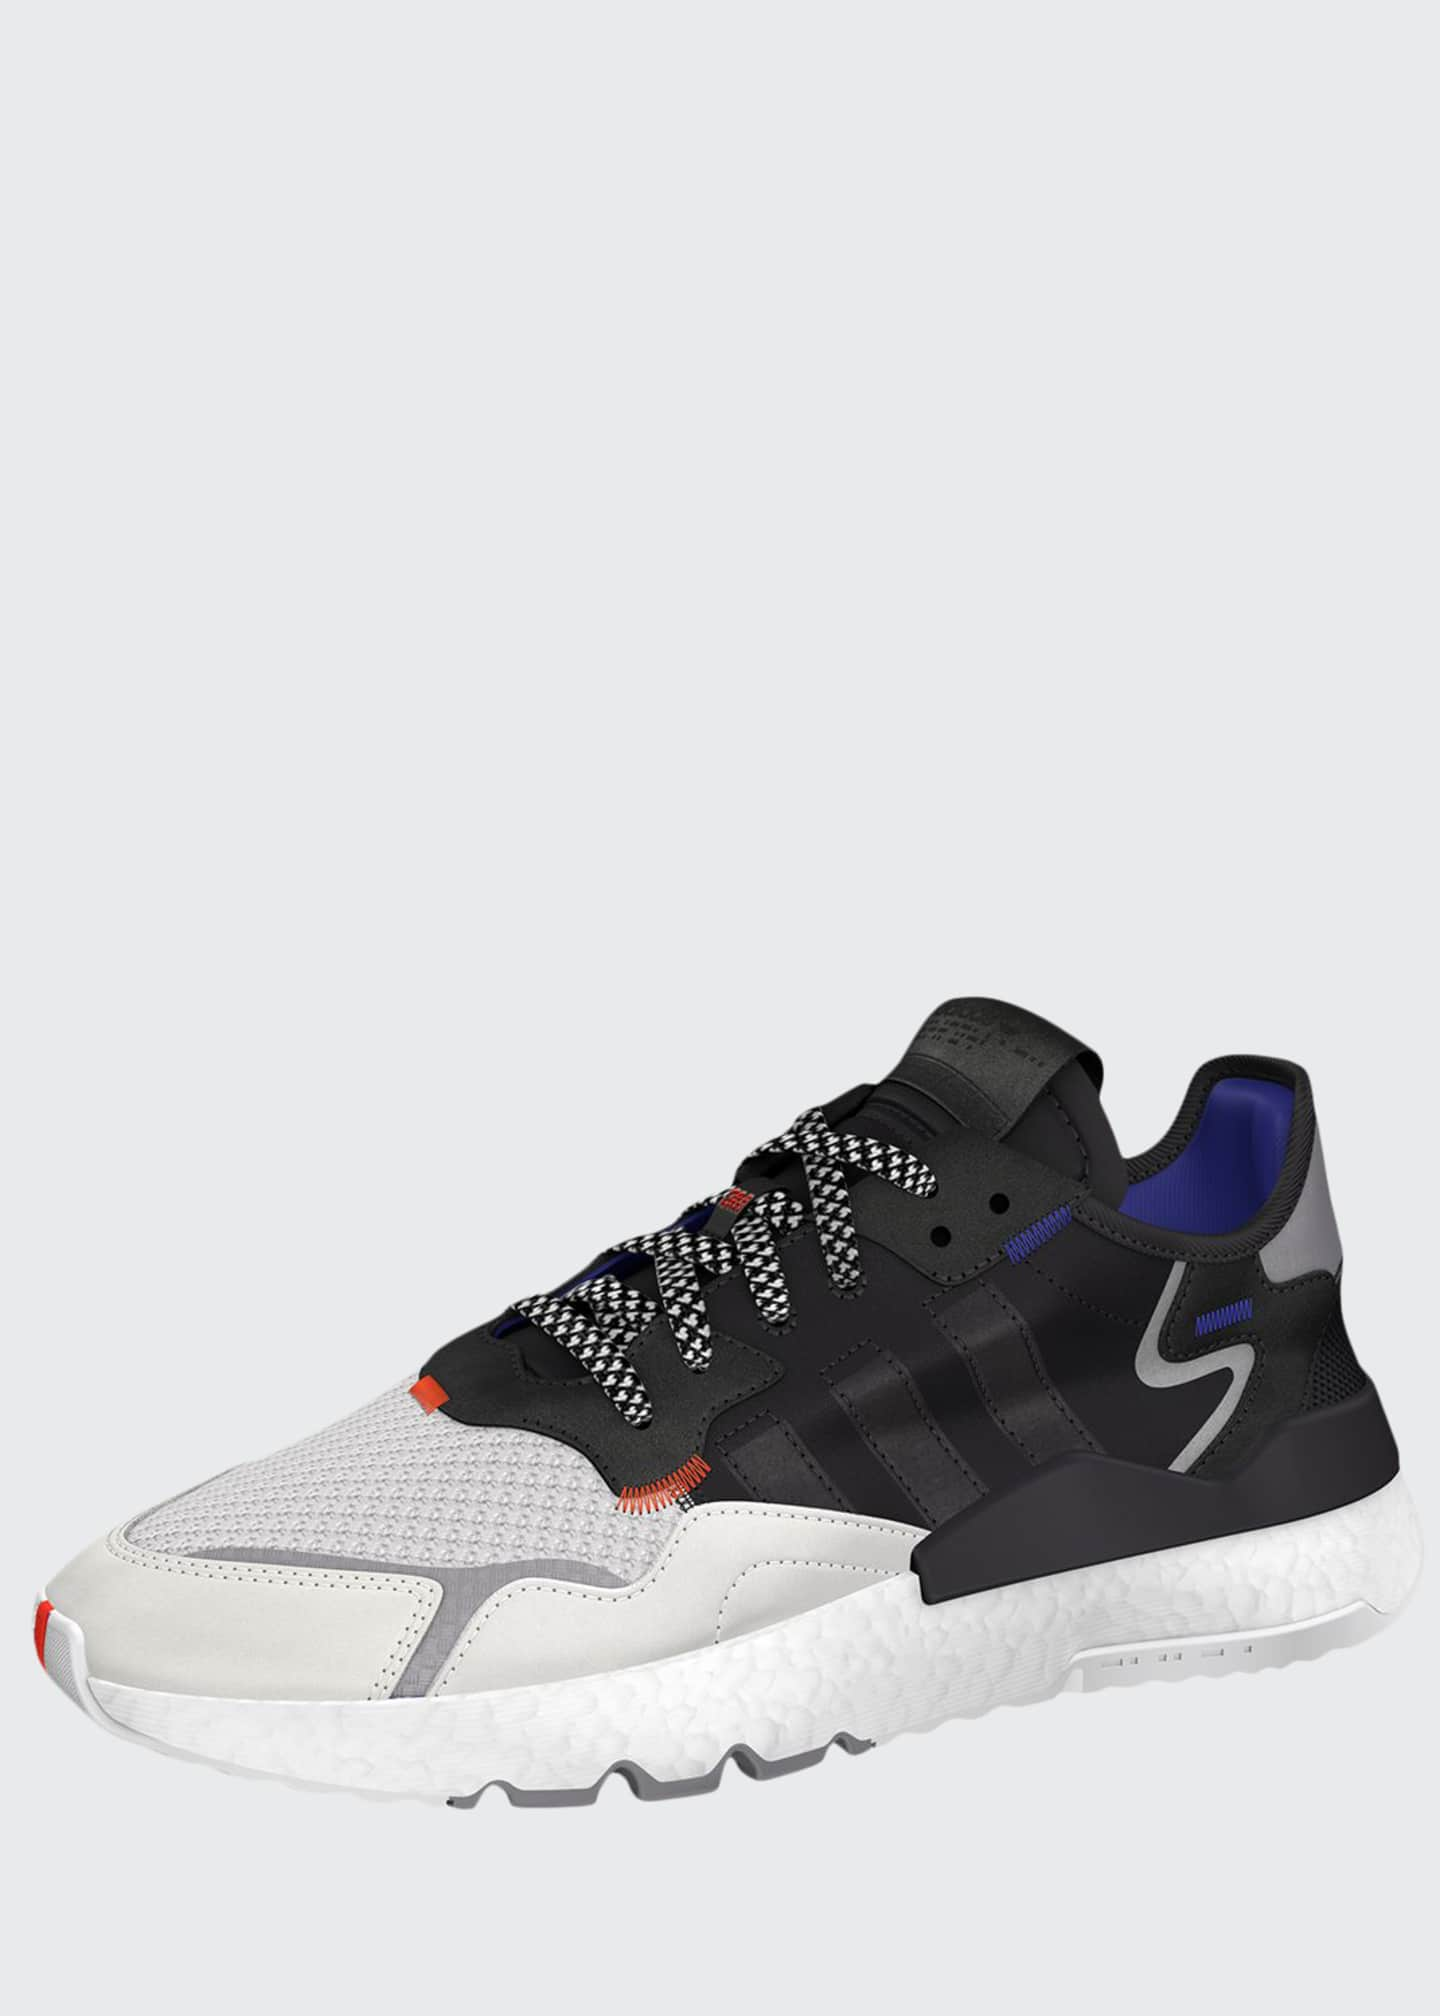 Adidas Men's Nite Jogger Graphic Trainer Sneakers